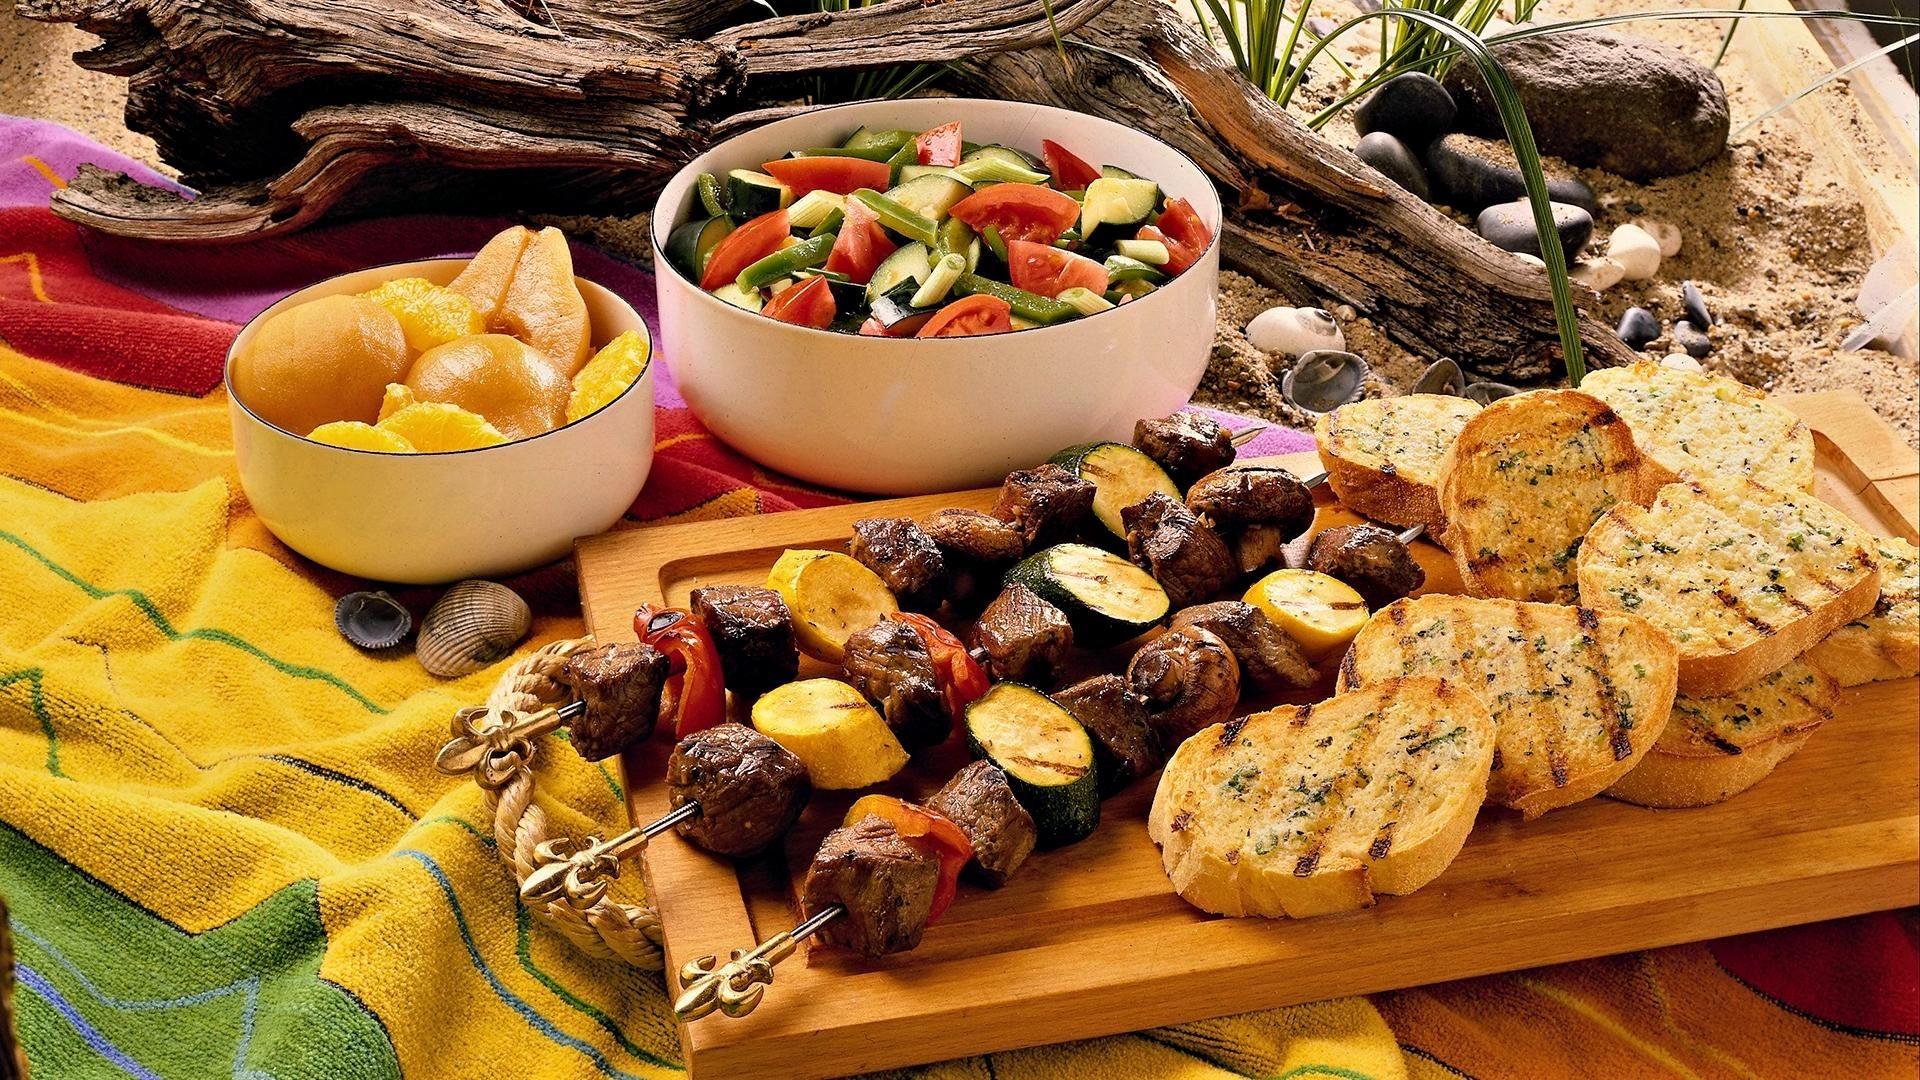 Wallpaper bread, vegetables, meat, food